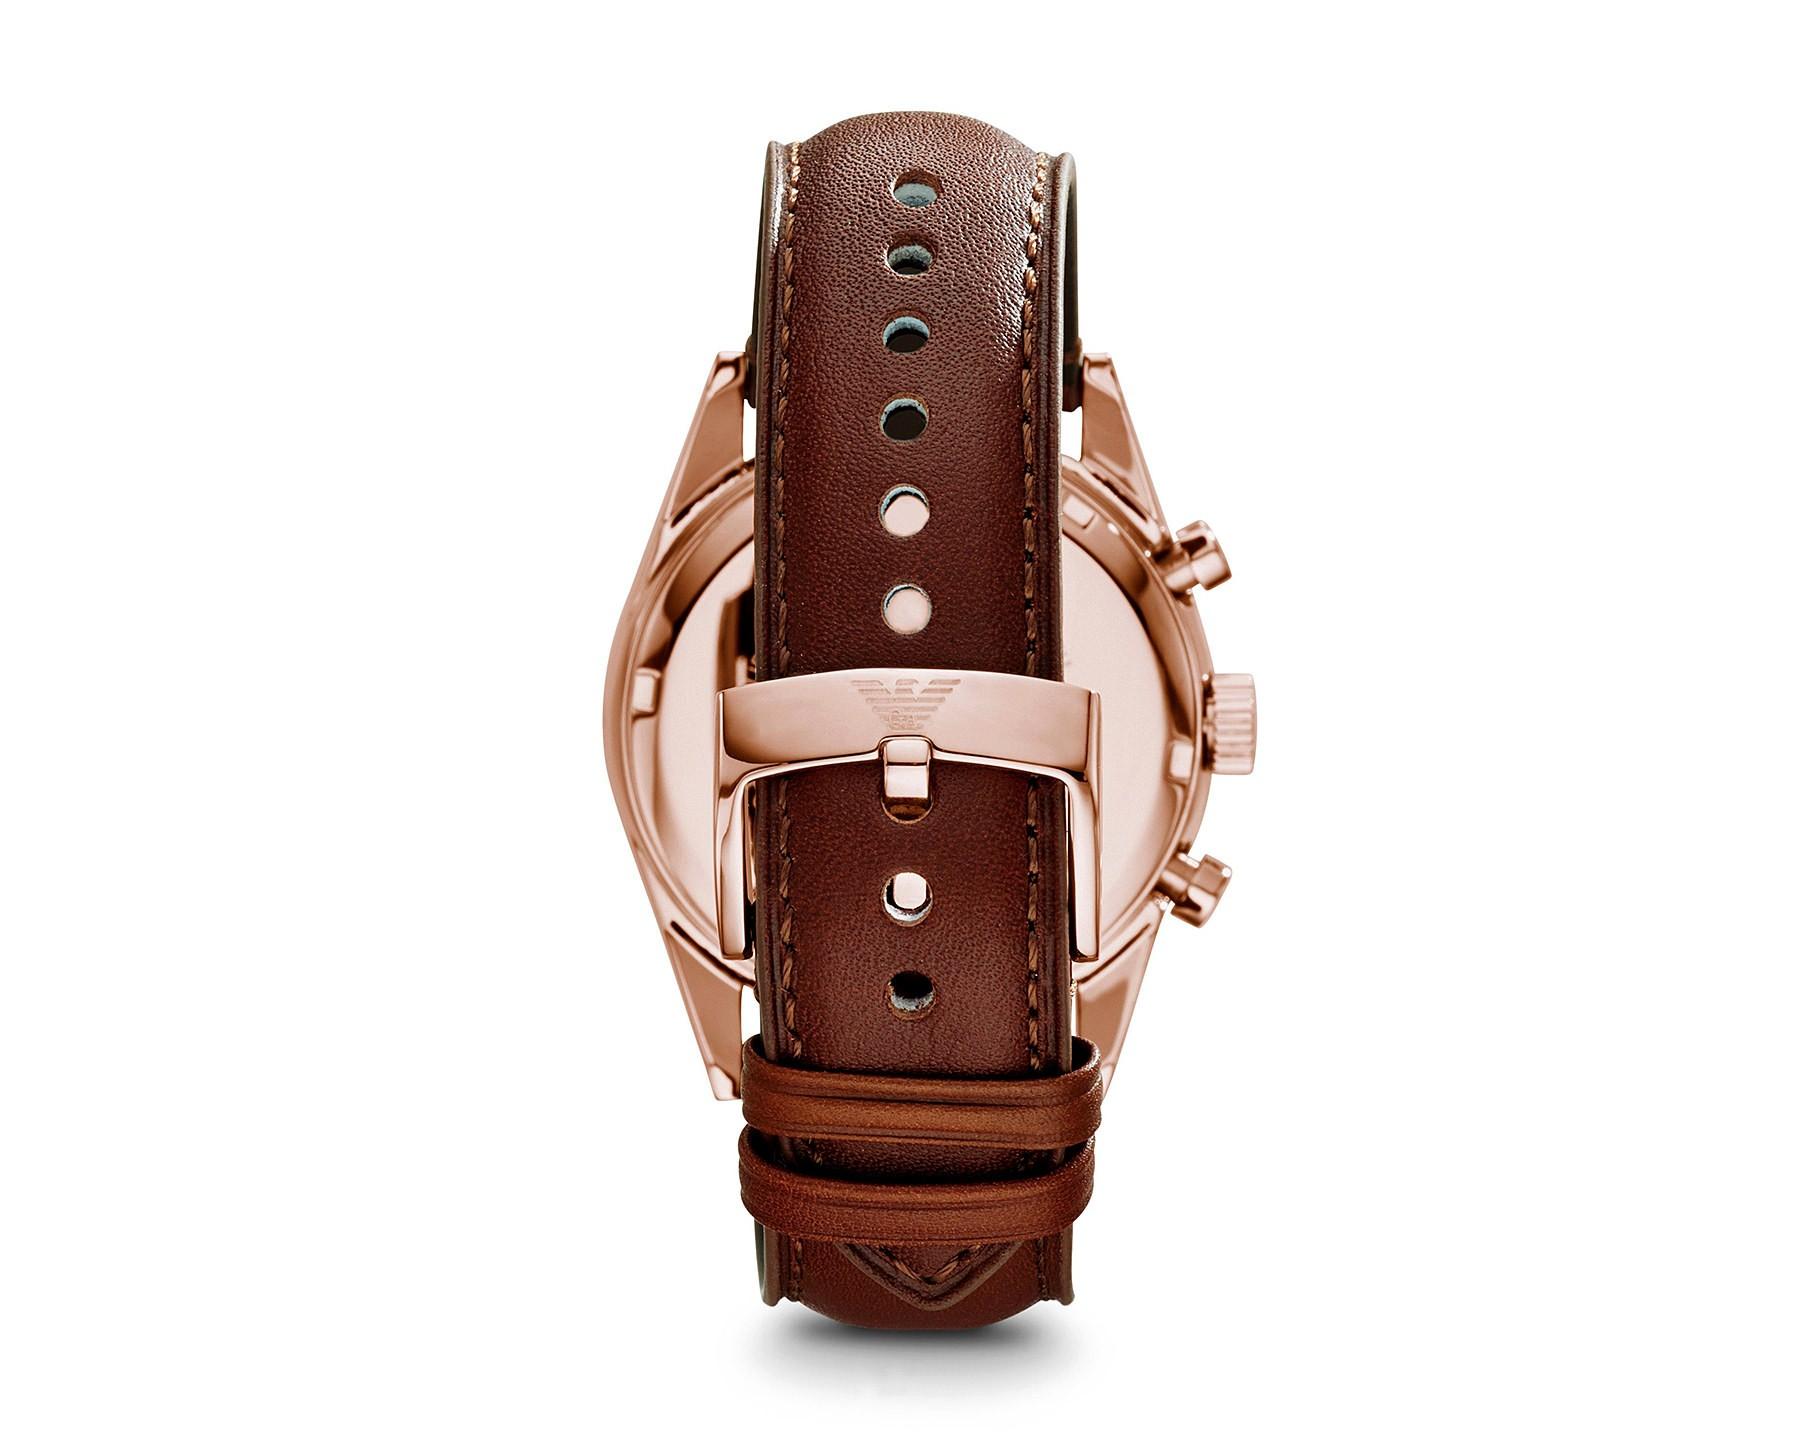 91cde09f6 Emporio Armani Mens Brown Leather Watch AR5995